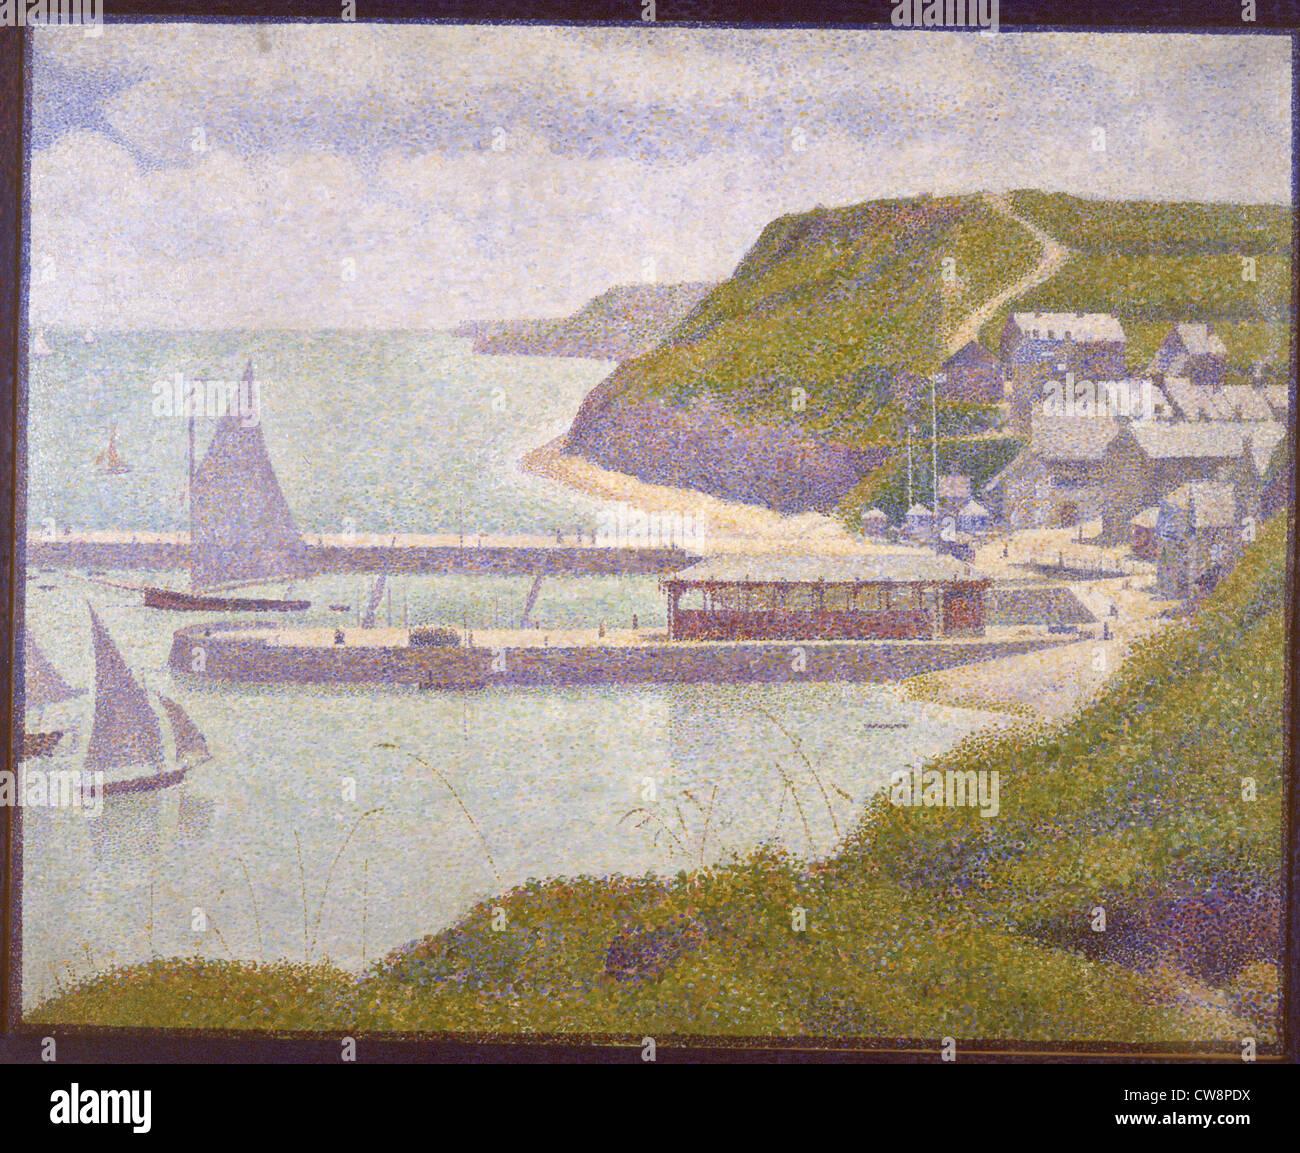 Seurat, Port-en-Bessin, outer harbor - Stock Image